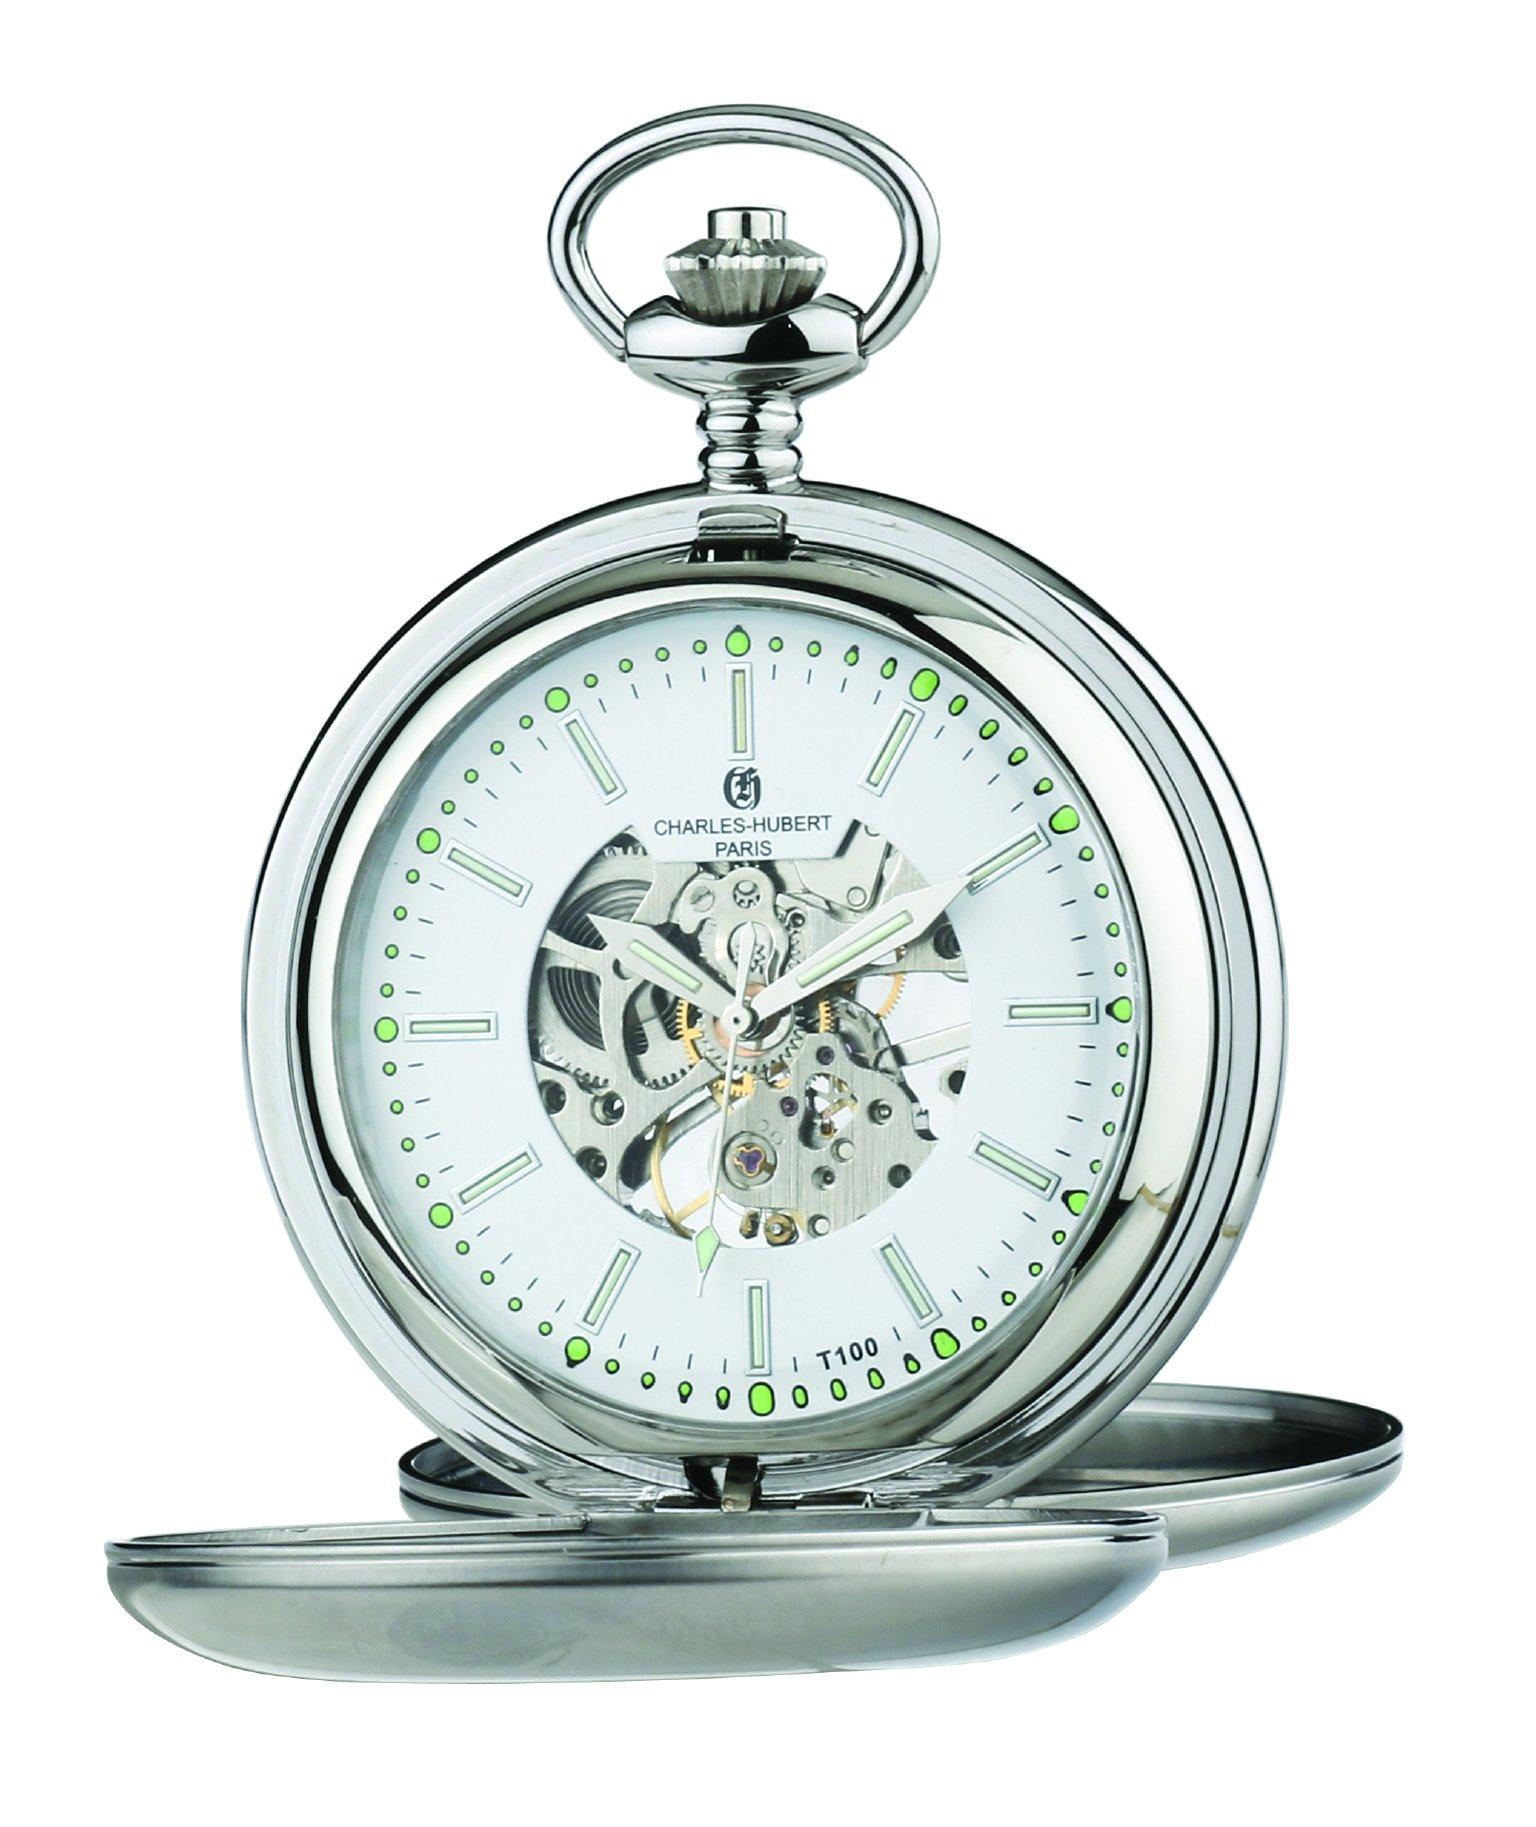 Charles Hubert Stainless Steel Double Cover Tritium Mechanical Pocket Watch XWA5561